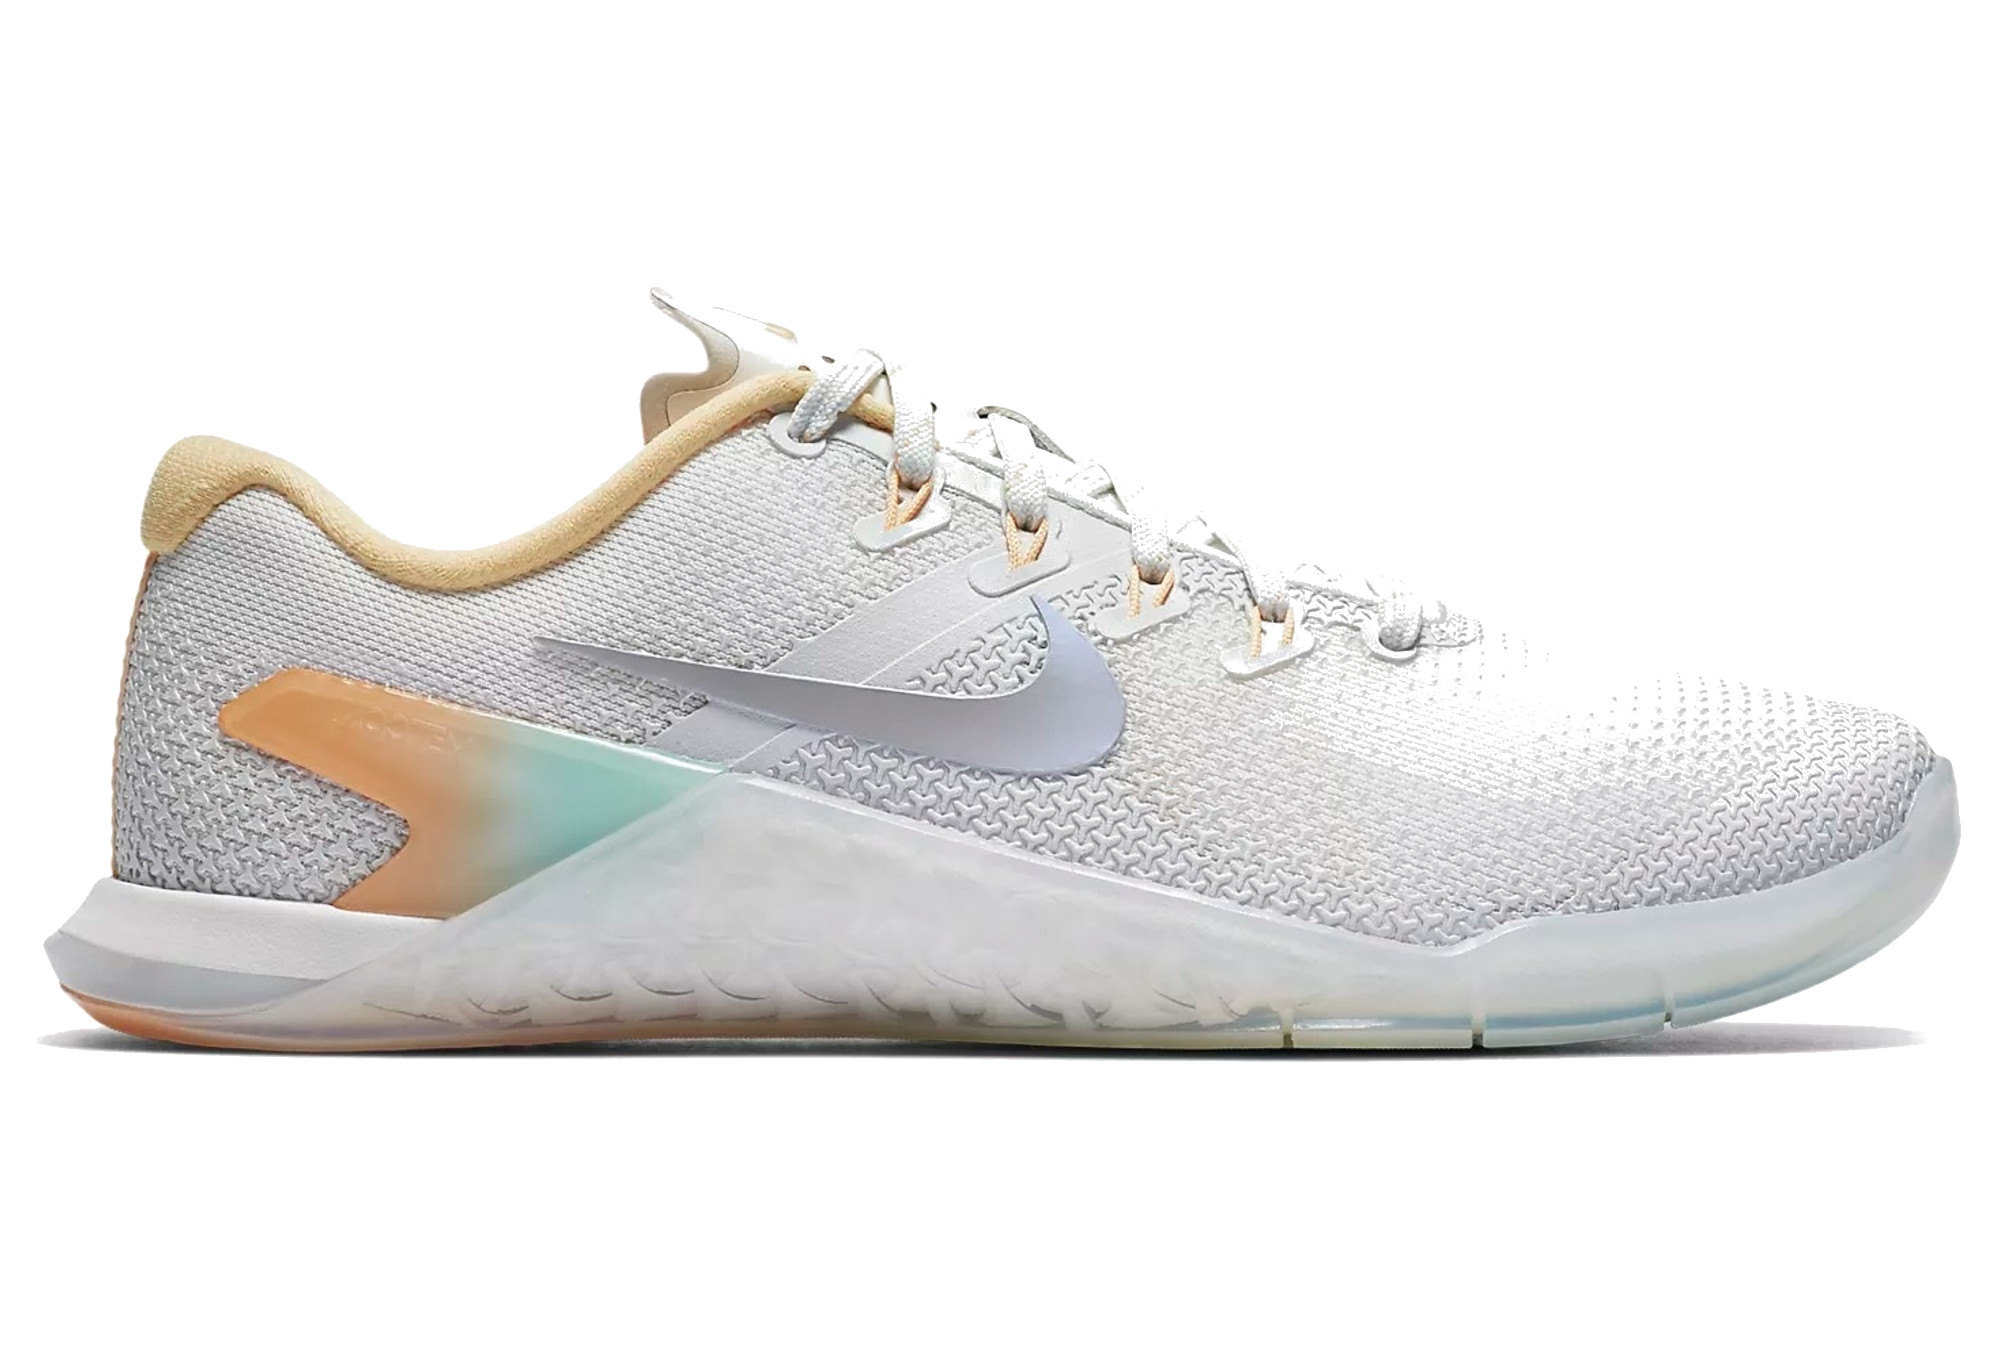 best service 20e44 b344d Chaussures de Cross Training Femme Nike Metcon 4 Rise